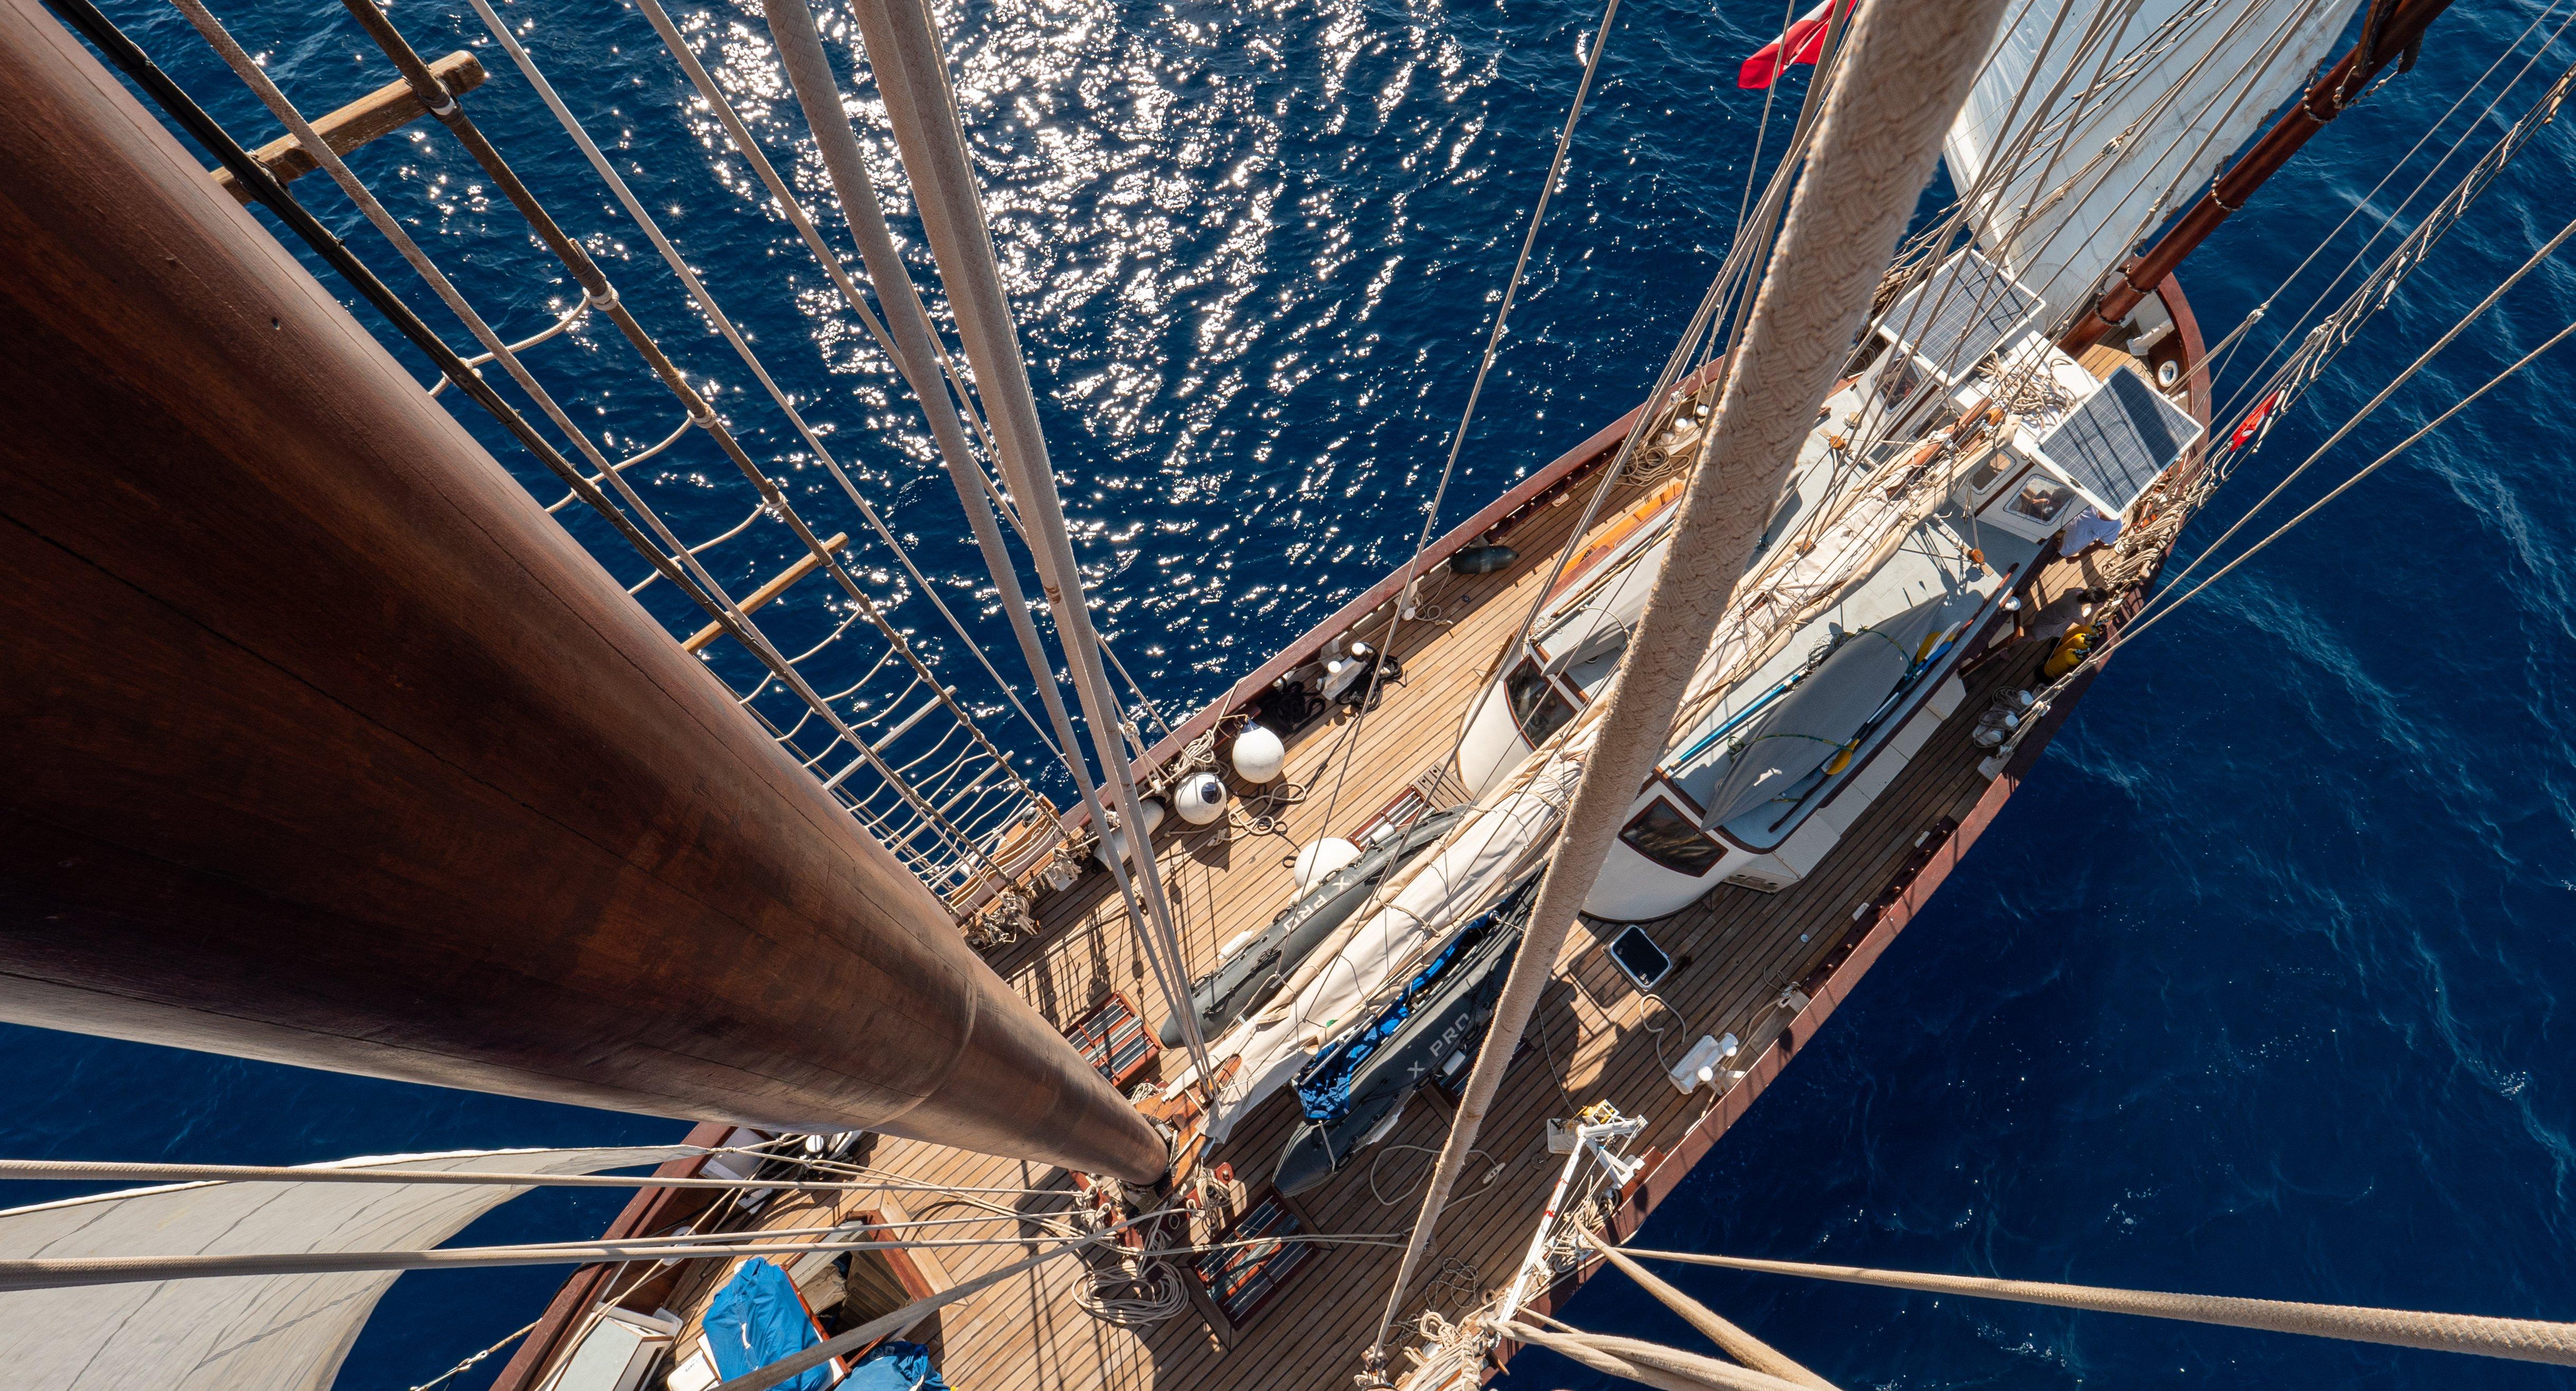 Swiss sailboat Fleur de Passion_8_Credit Transnational Red Sea Center:Fabiano D'Amato.jpg